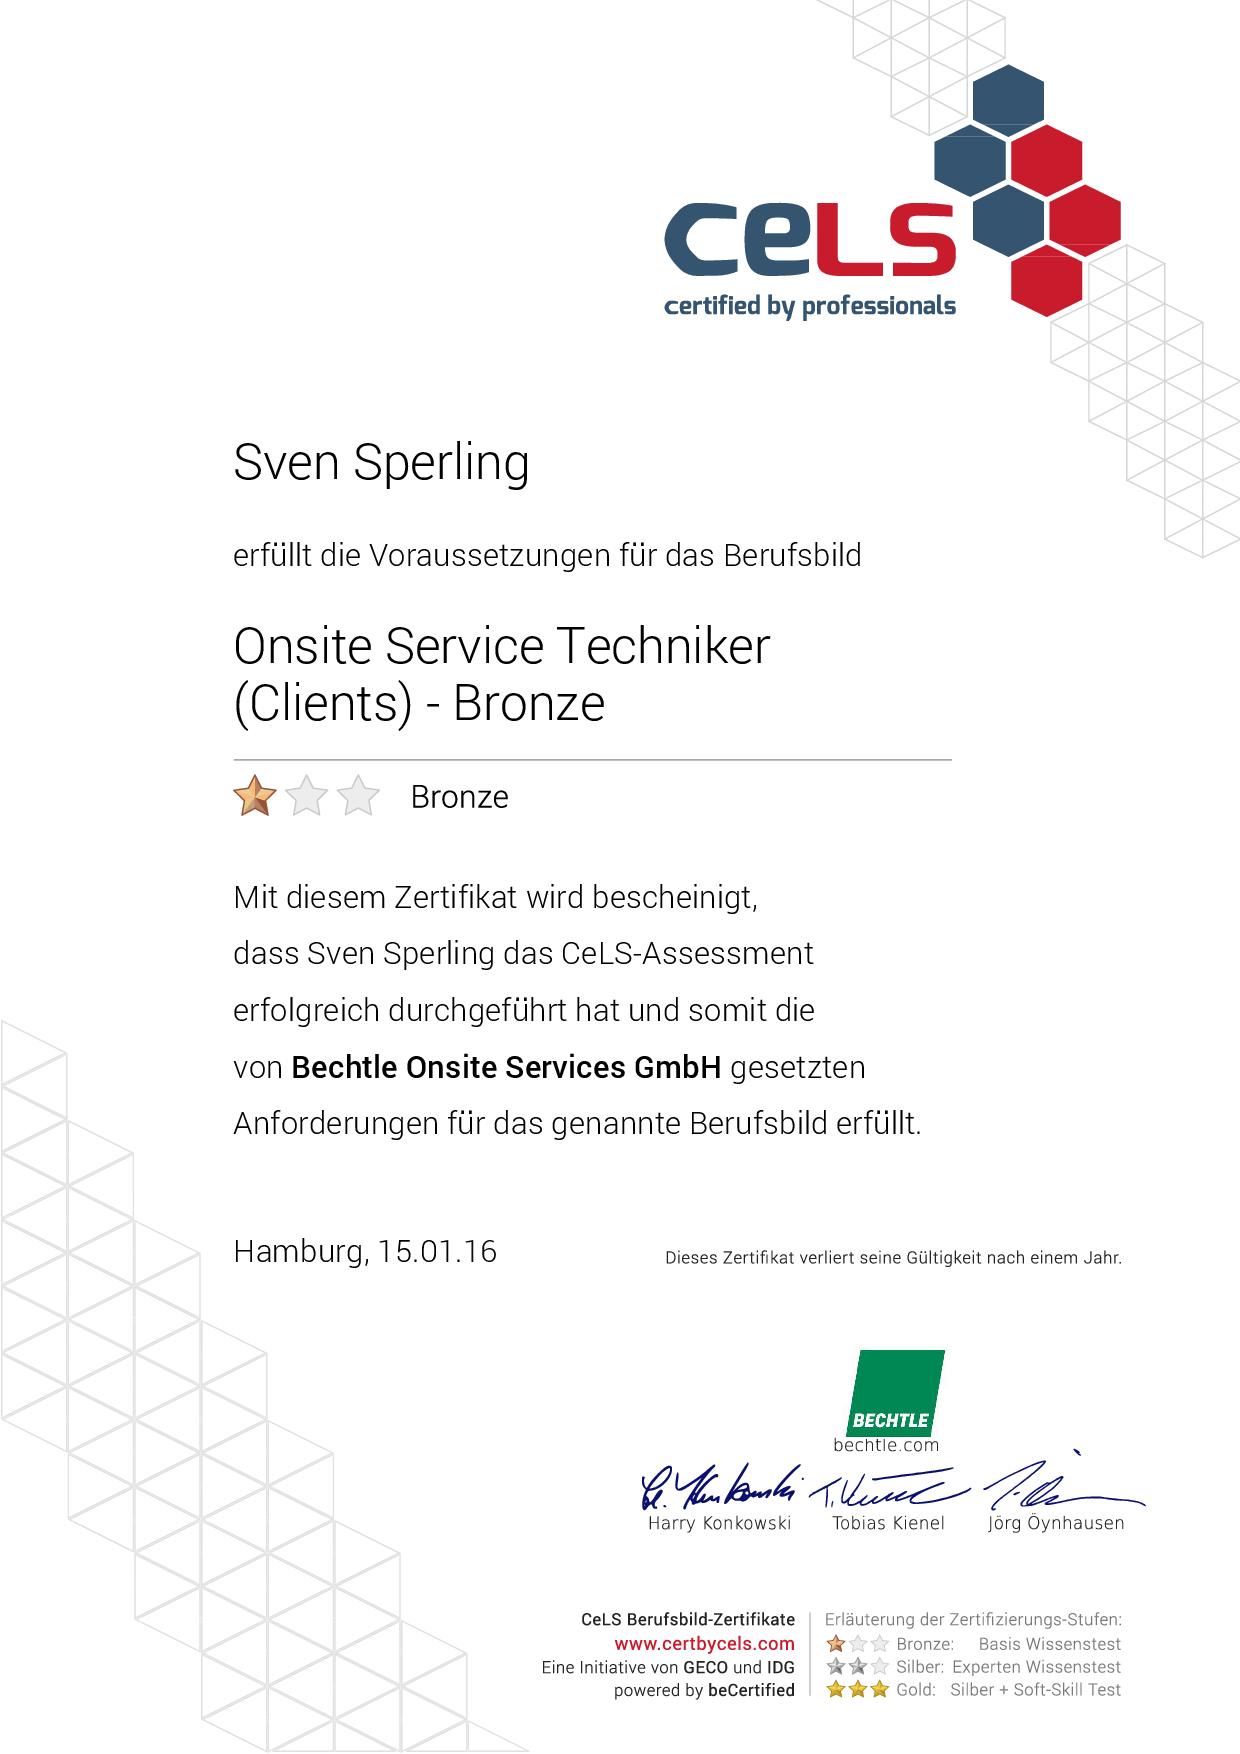 CELS – Onsite Service Techniker (Clients) Bronze Zertifikat